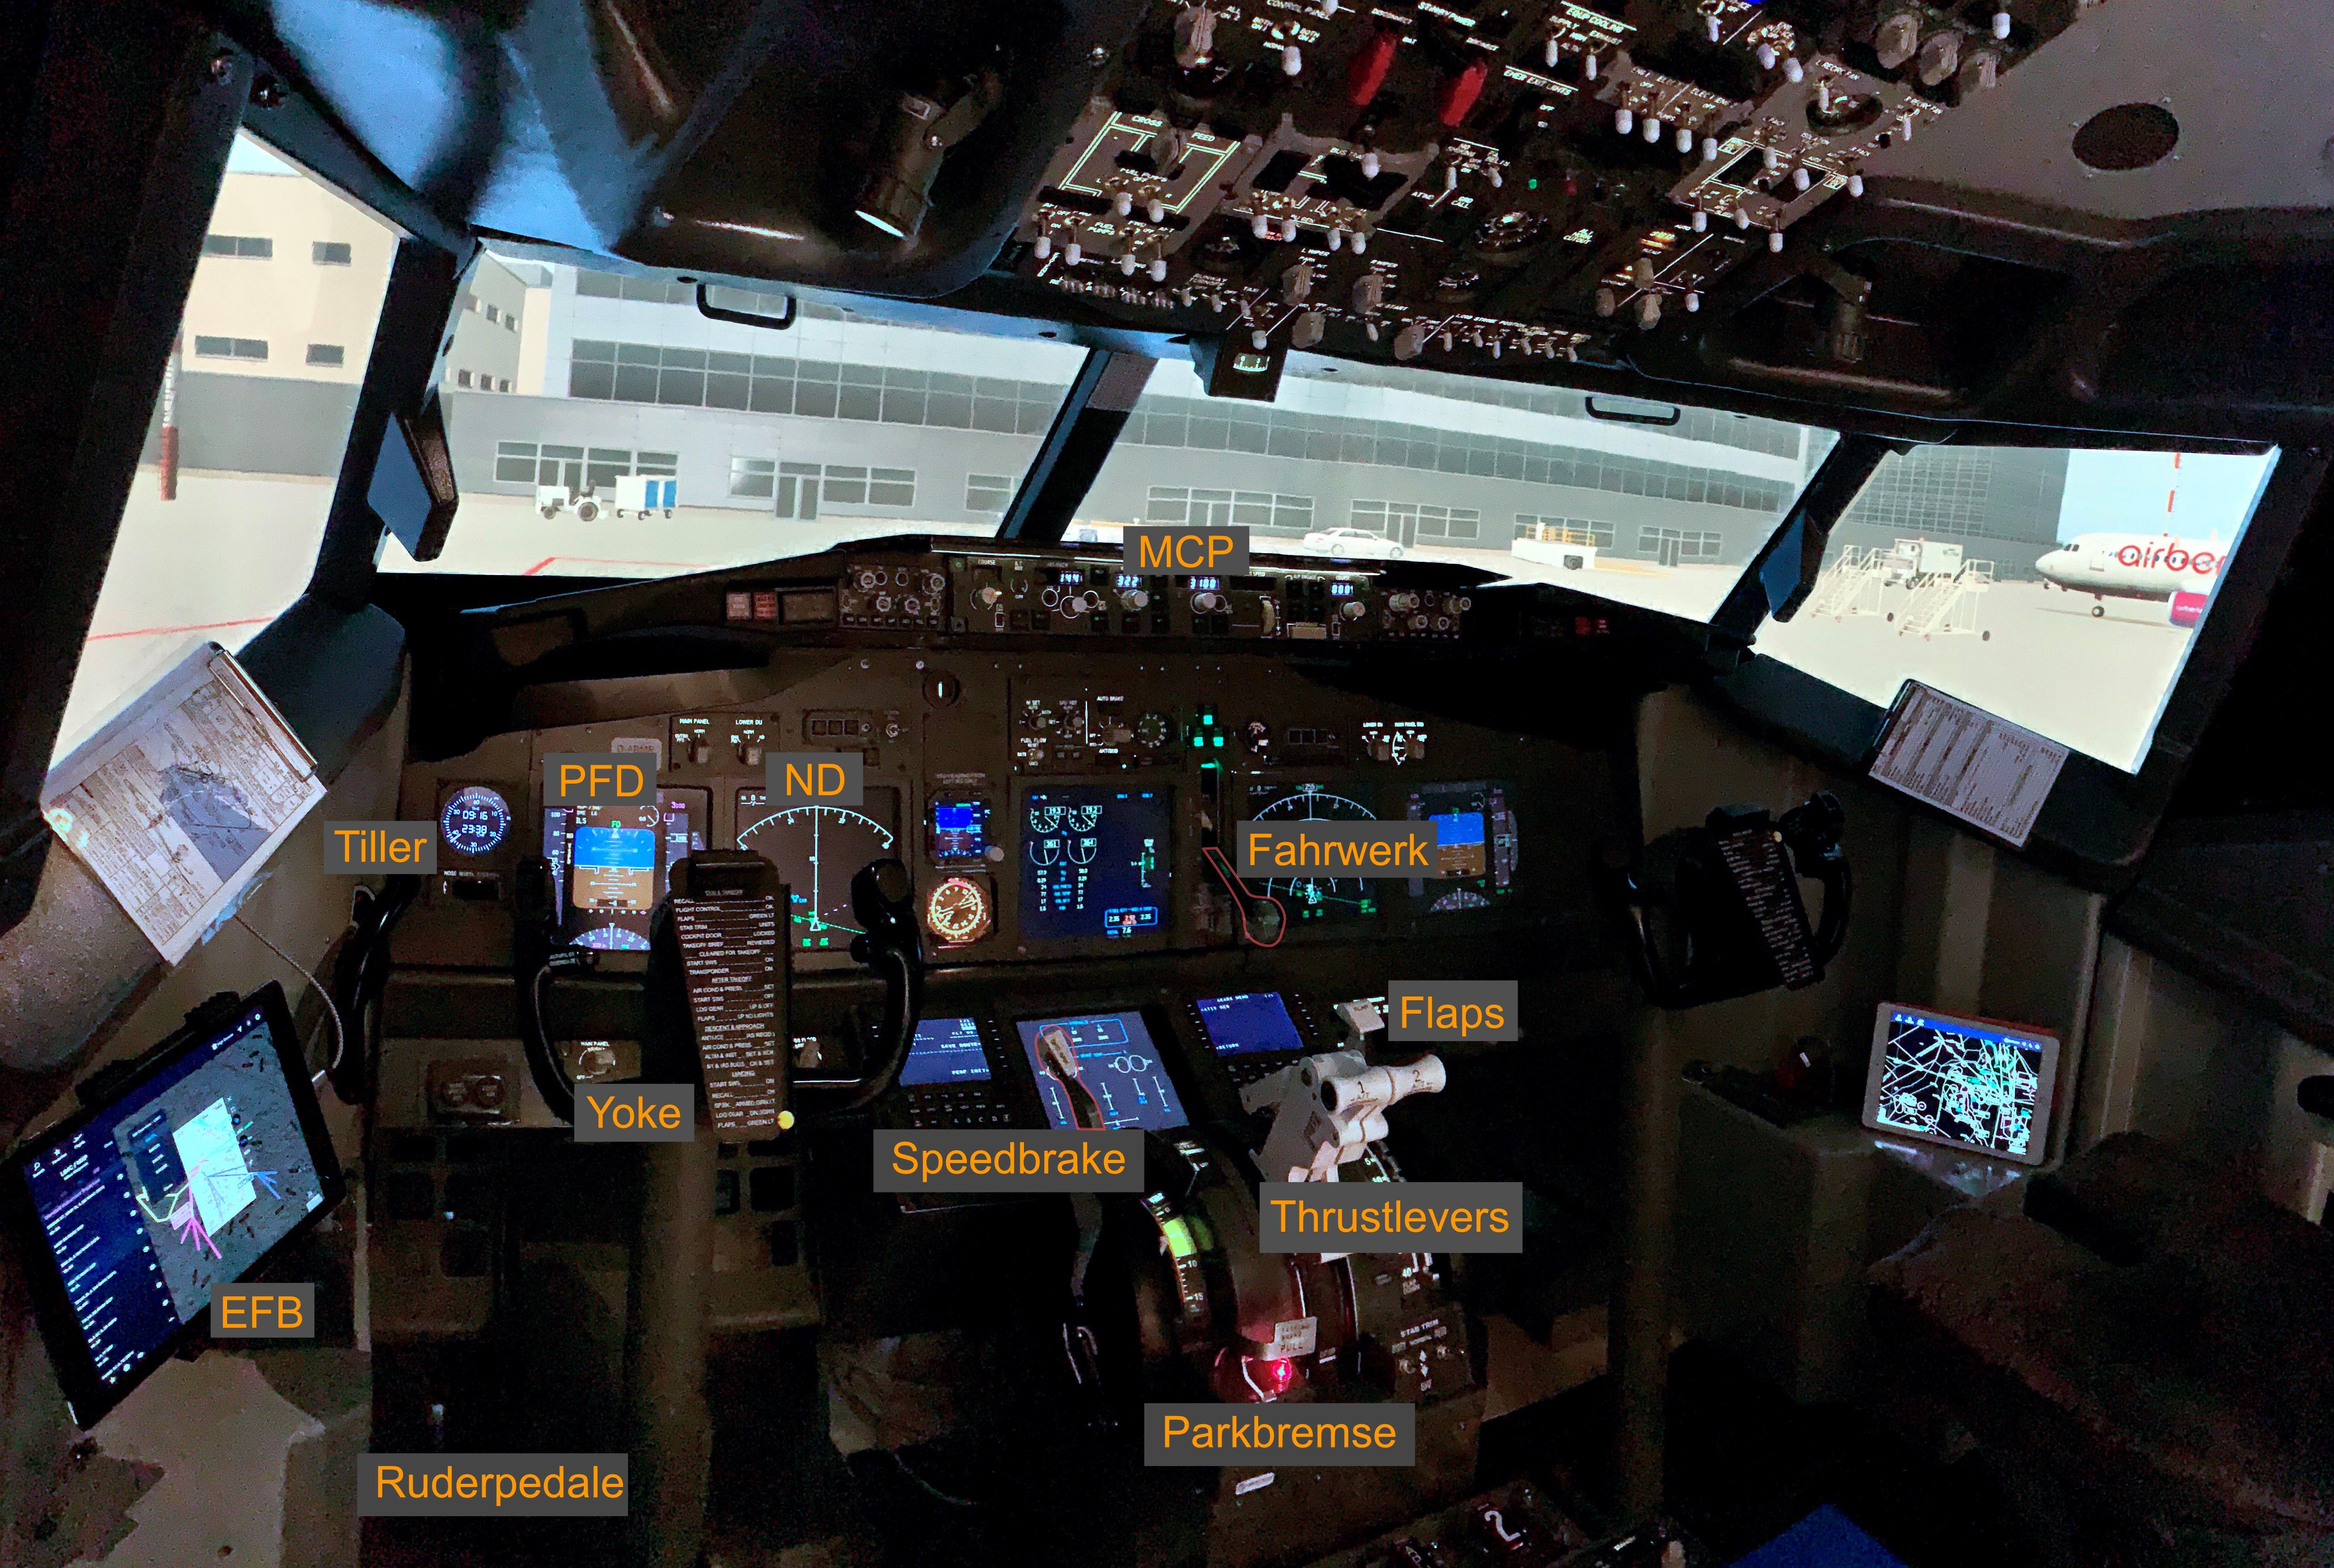 737Flugsimulator_München_Erklärbild